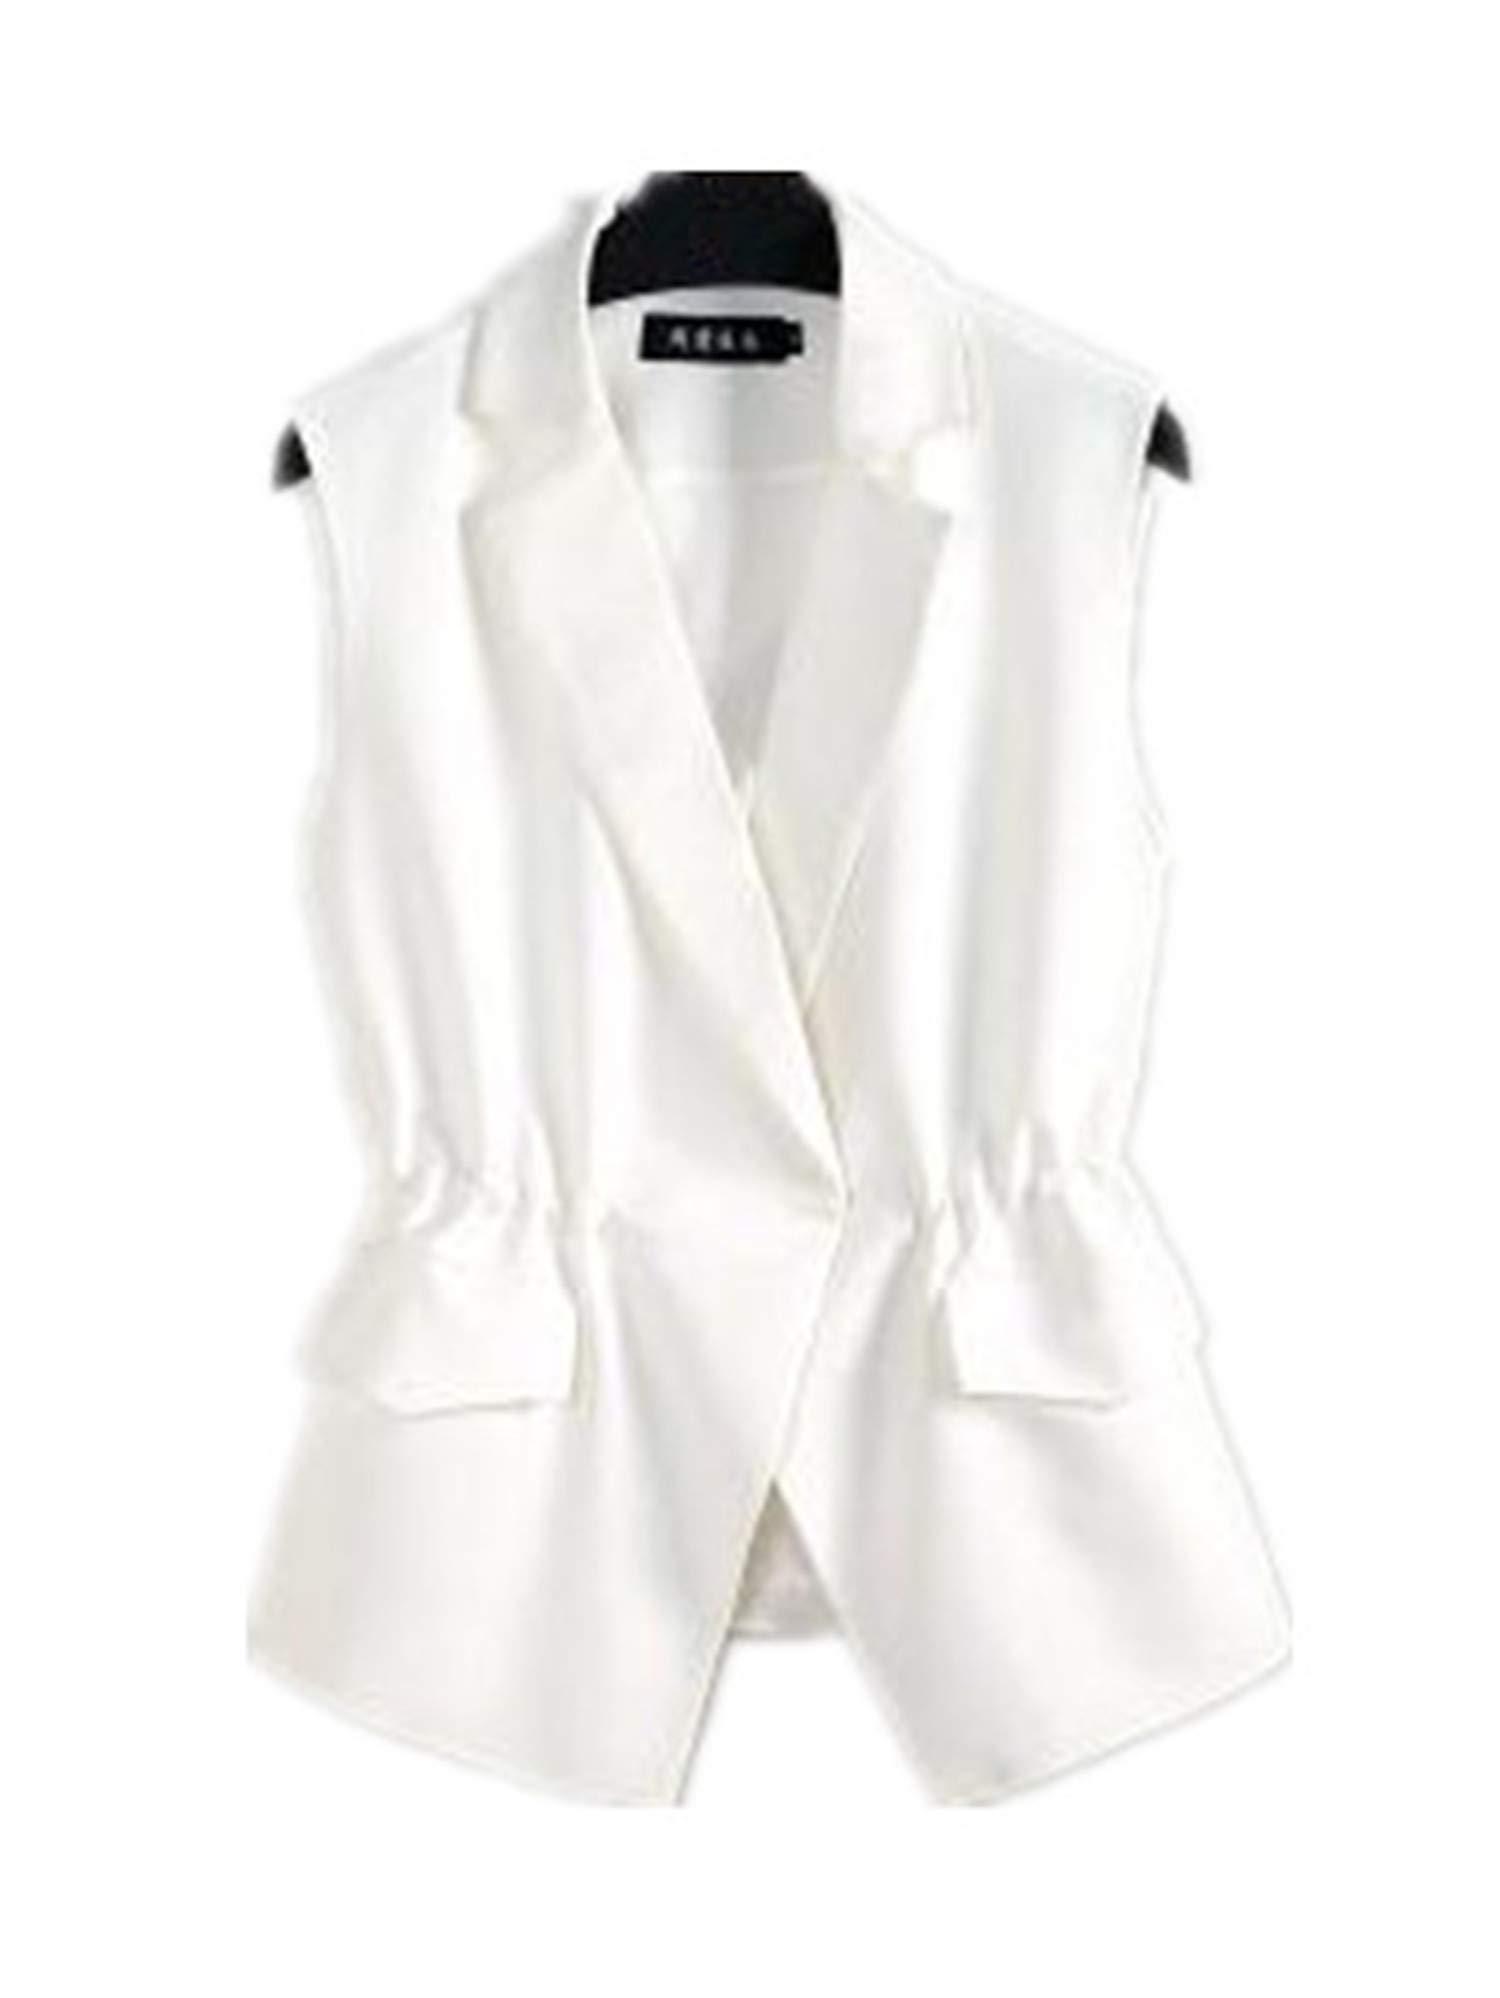 Giles Abbot S-2XL New OL Fashion Women Suit Vest Short Style Elastic Waist Slim Elegant Jackets